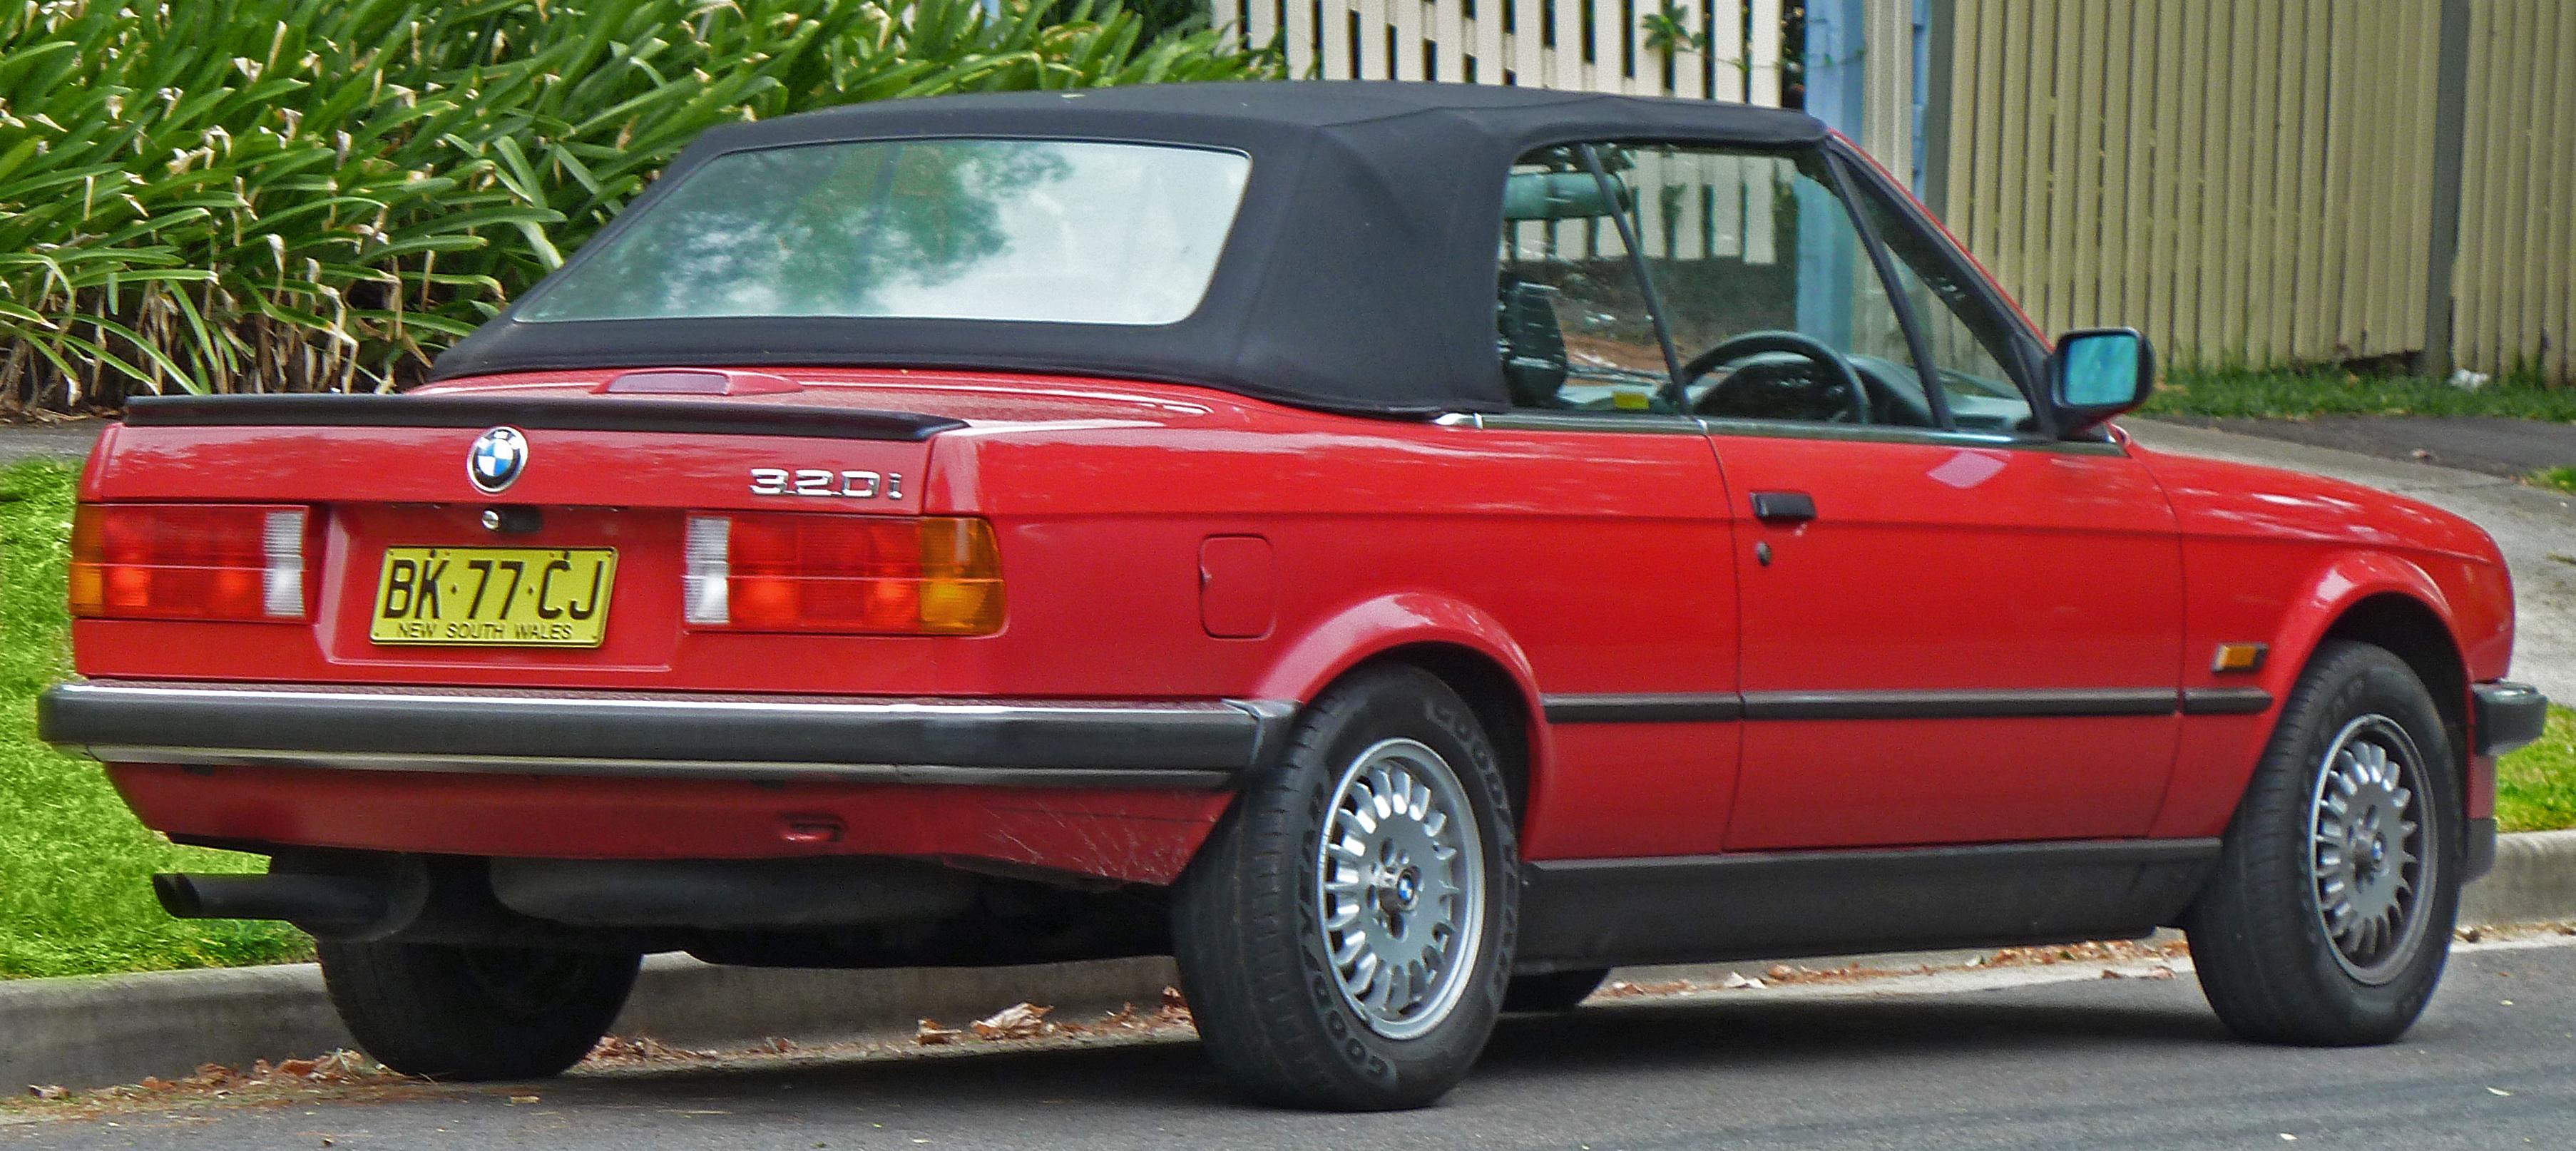 File 1988 1990 Bmw 320i E30 Convertible 2011 03 10 Jpg Wikimedia Commons